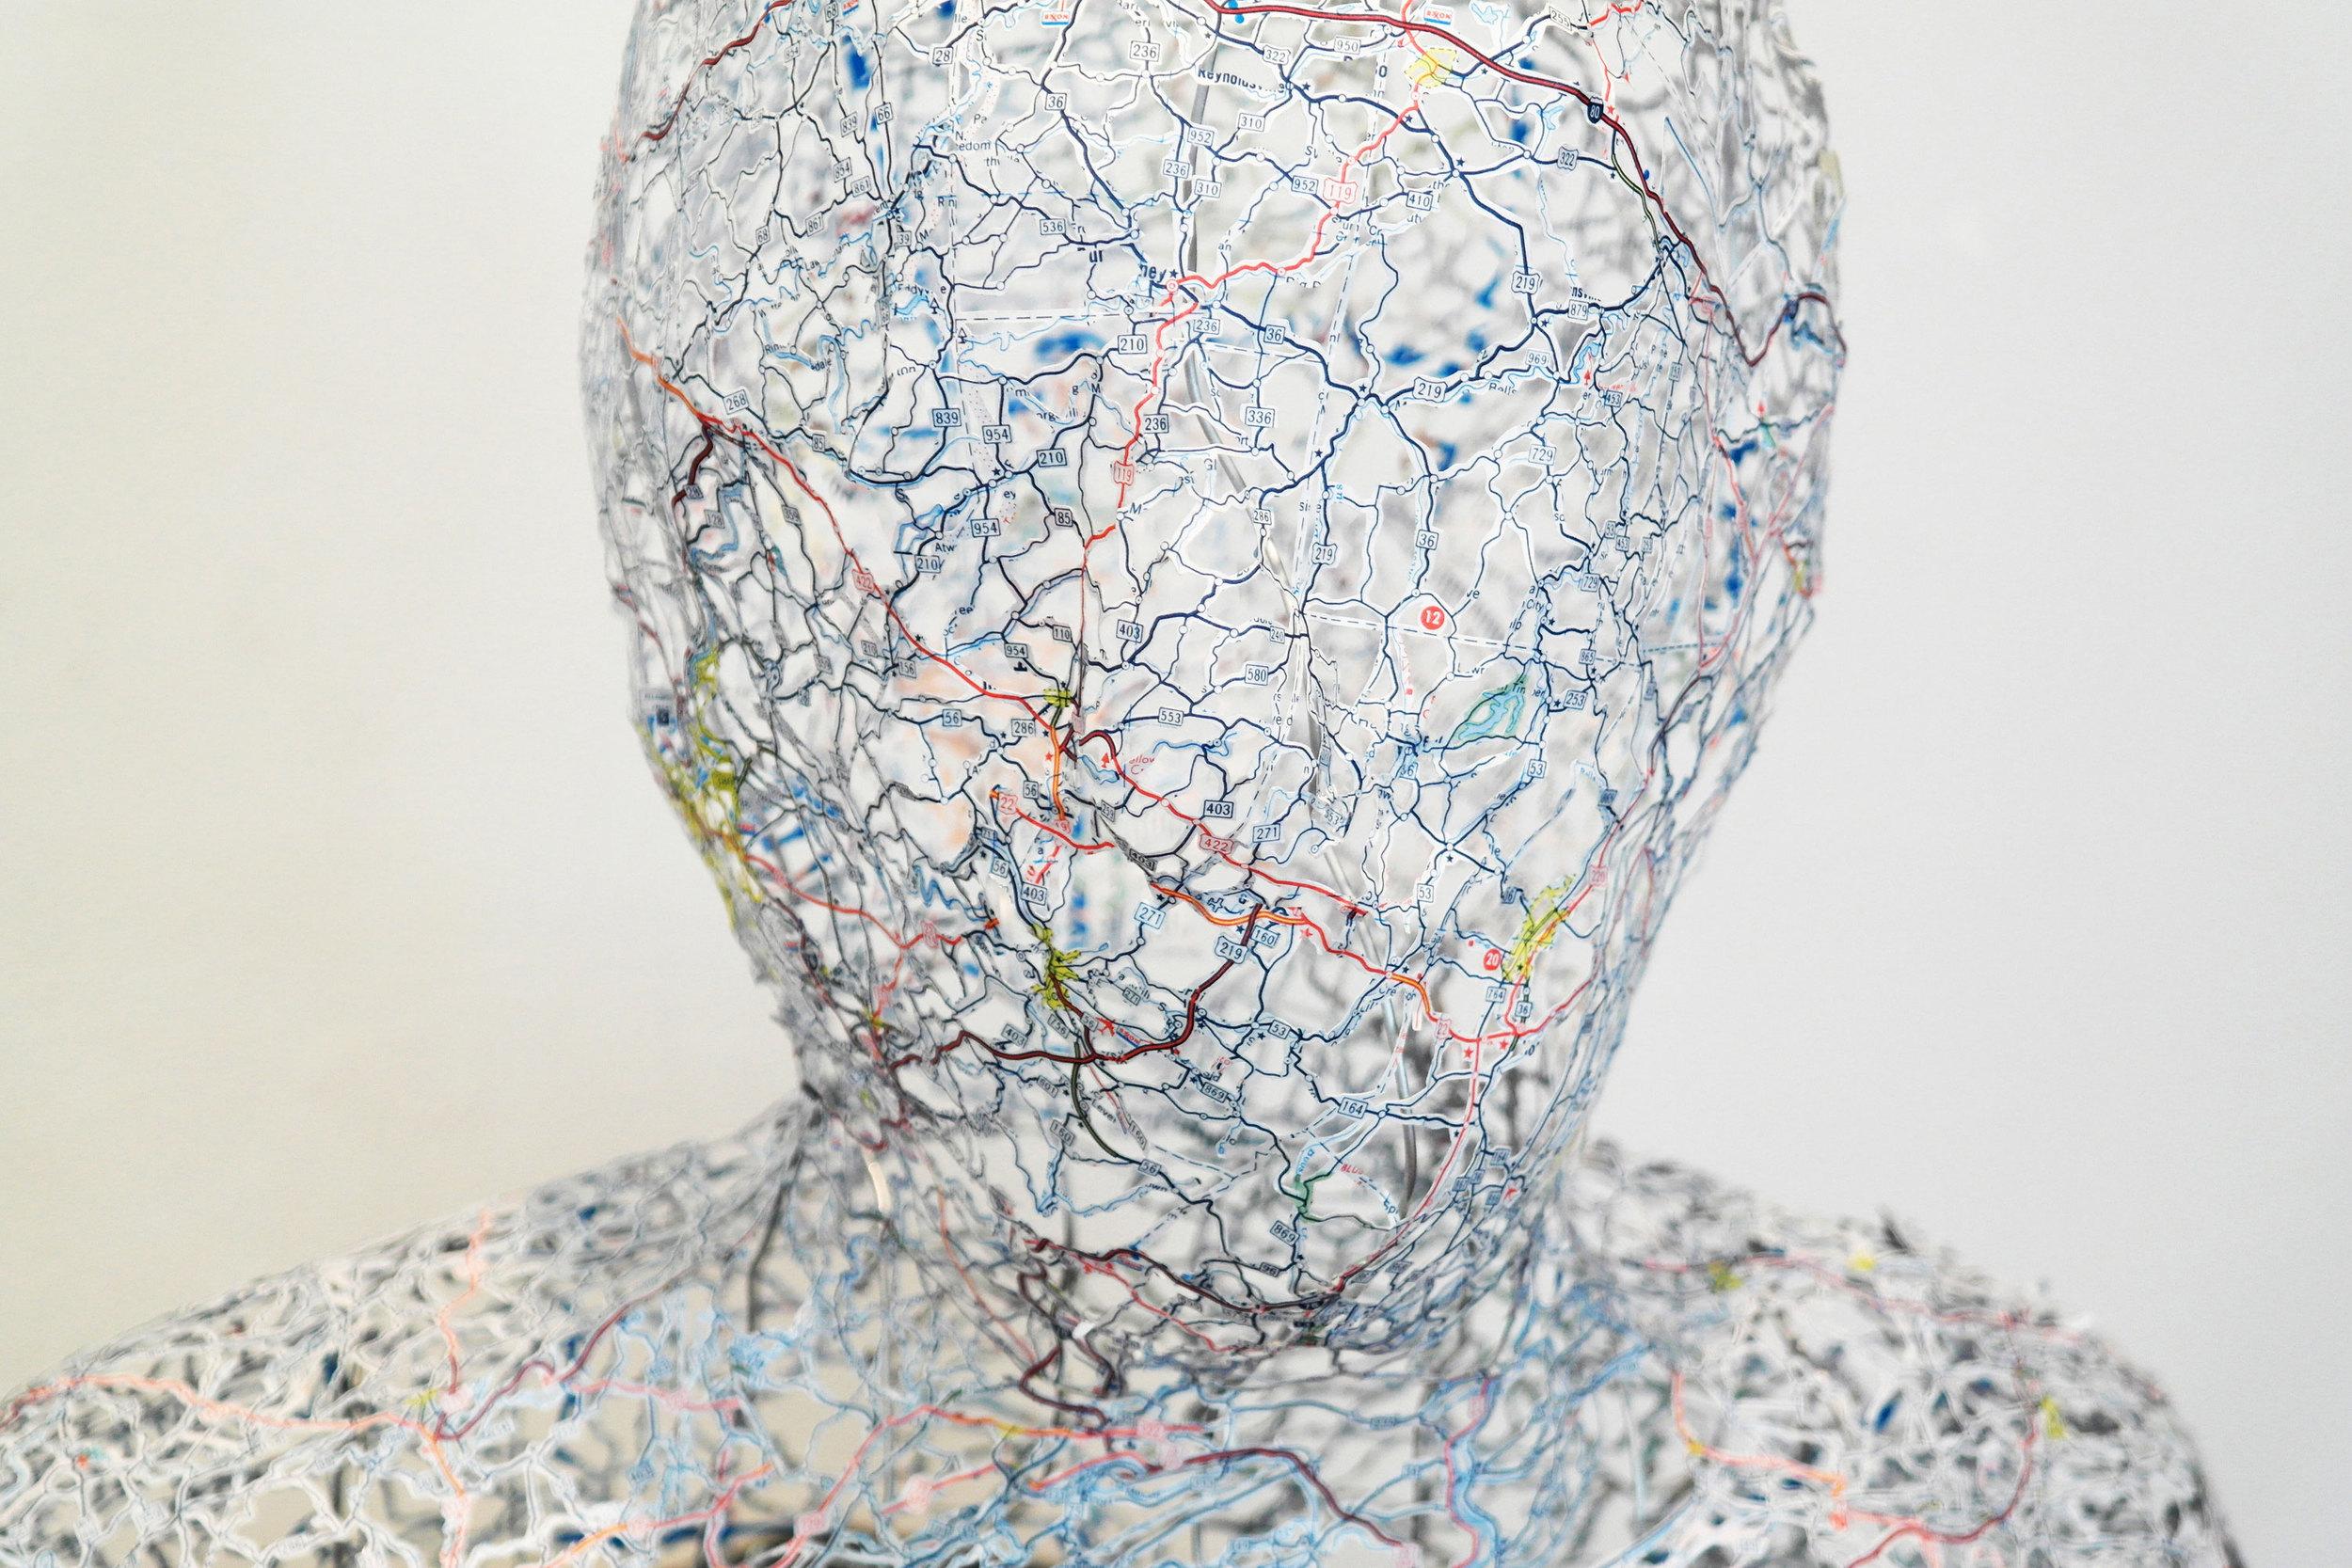 Untitled (Self-Portrait) detail